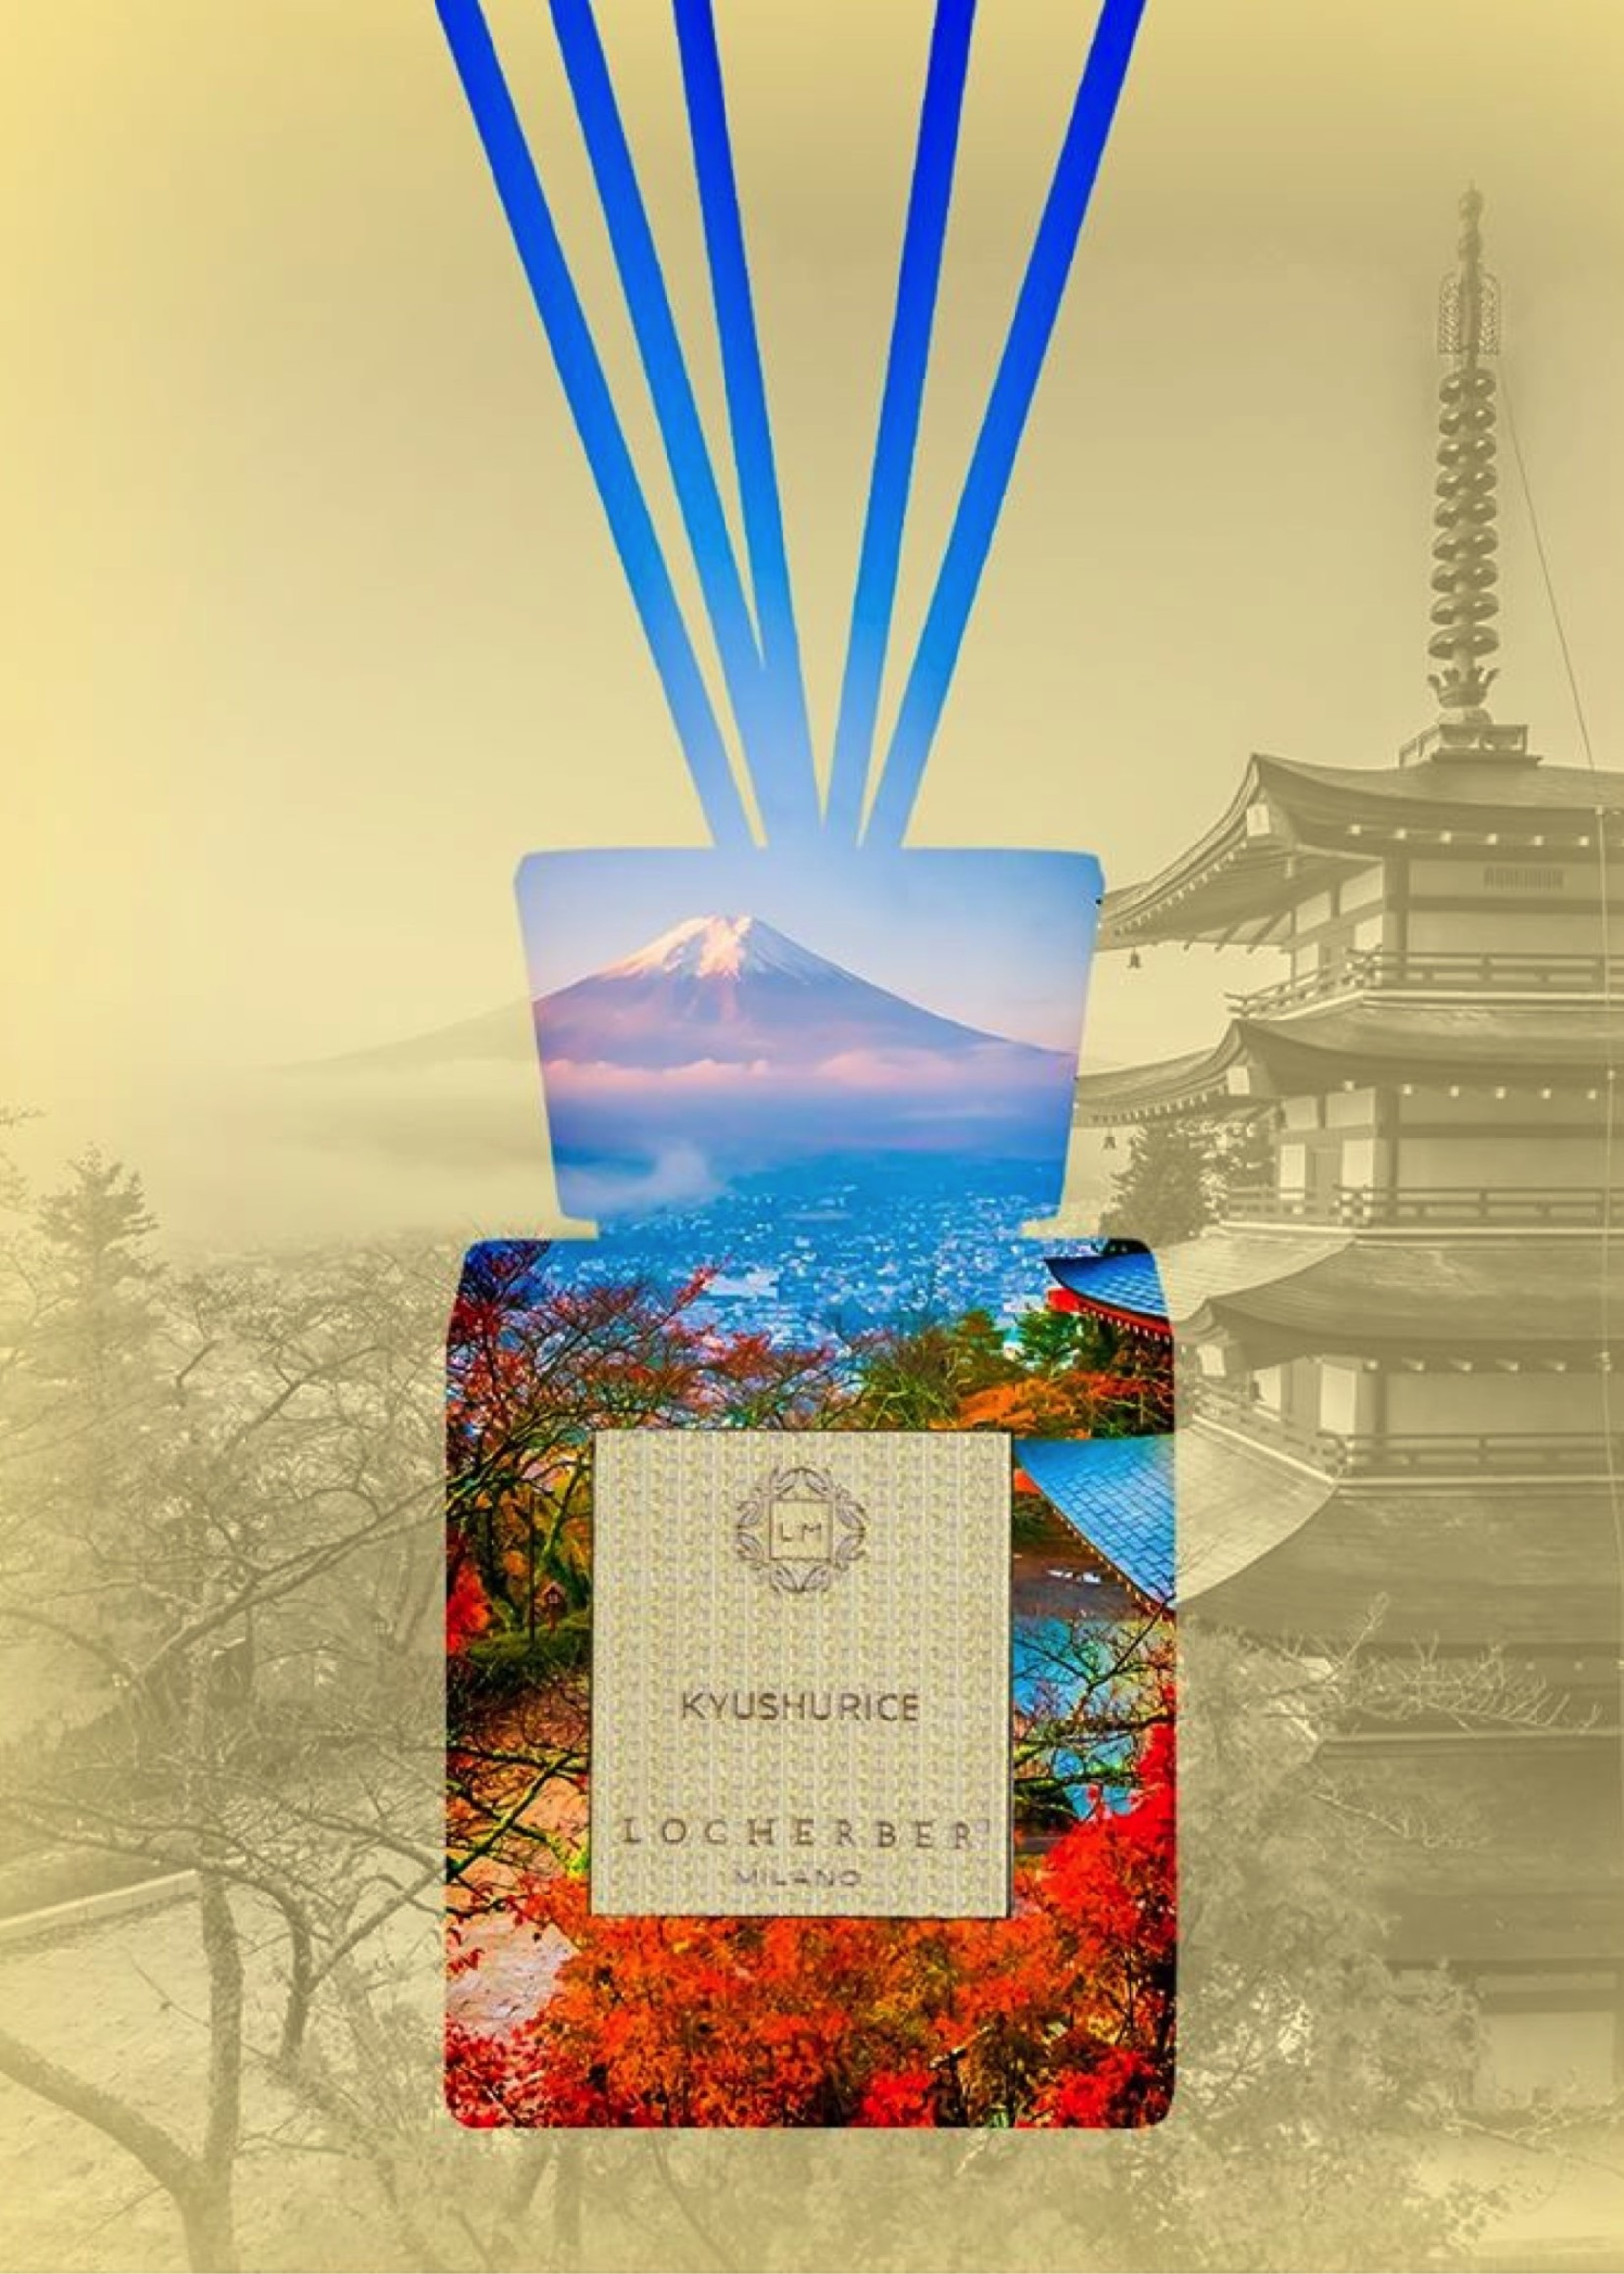 Locherber Locherber Milano - Kyushu Rice - Diffuseur à Bâtonnets